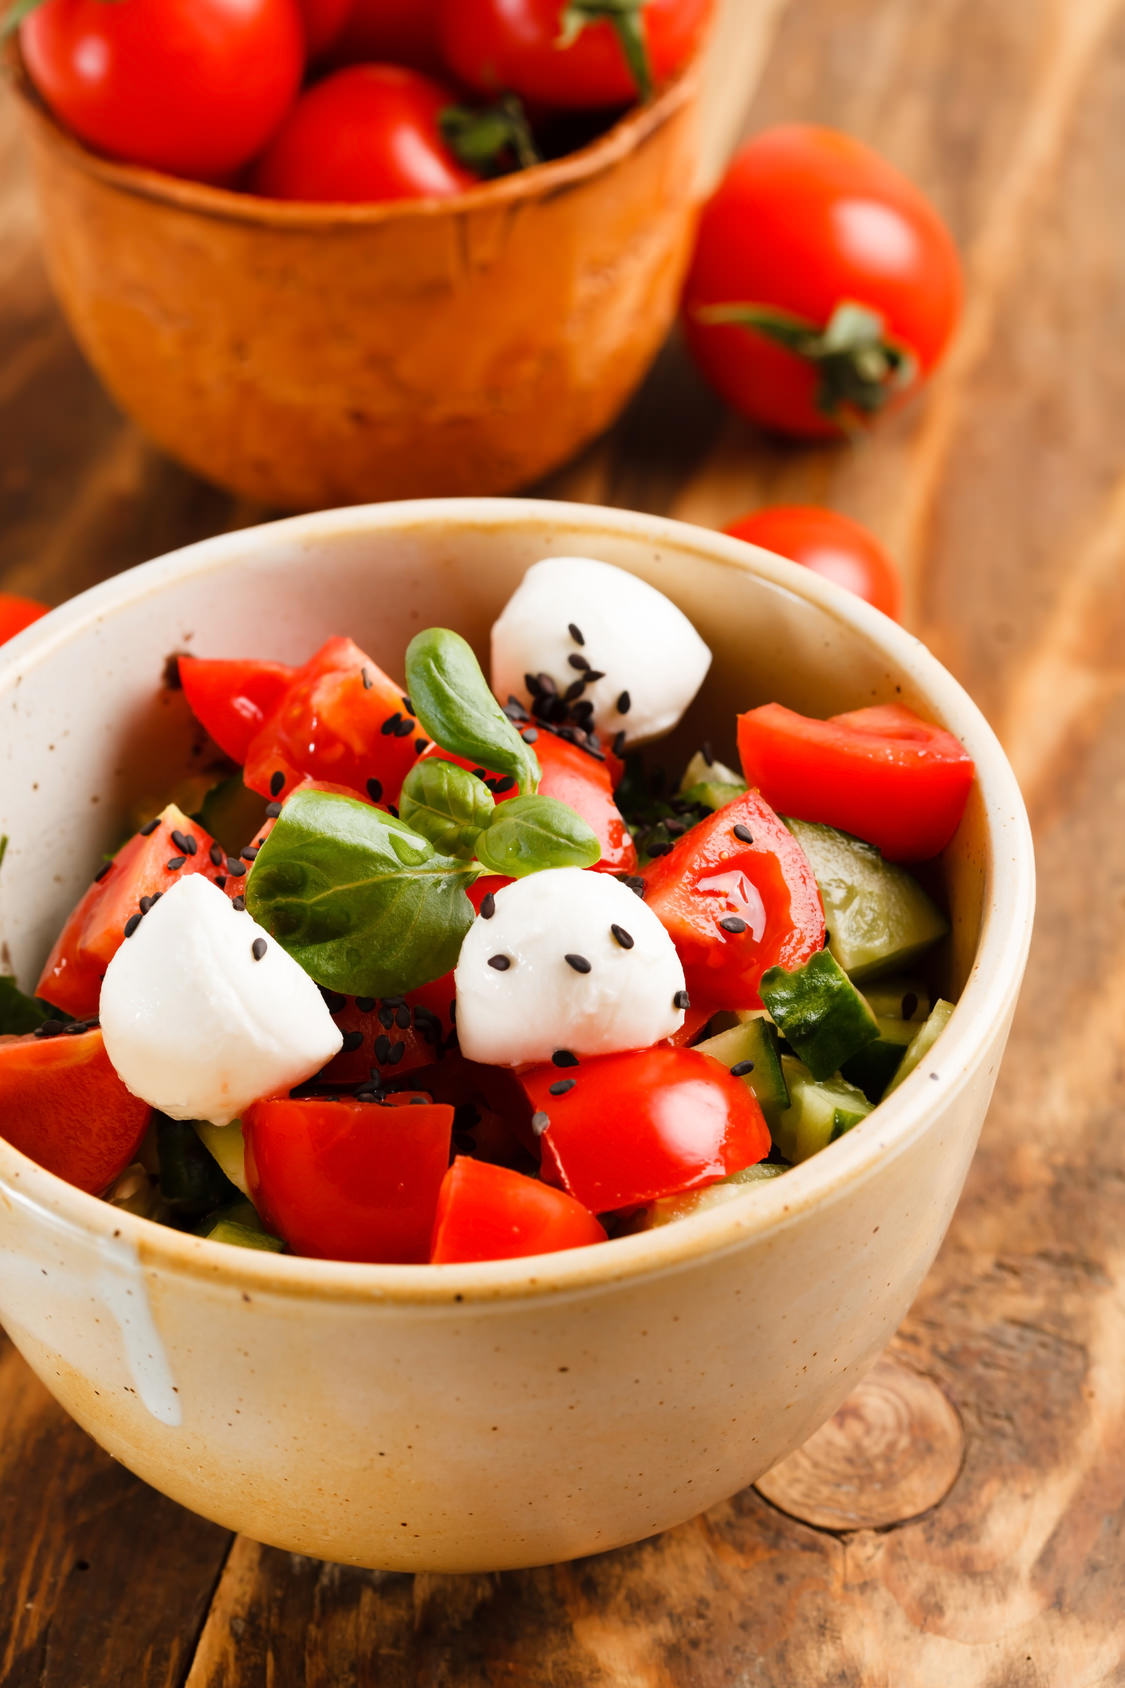 Salade de tomates concombre mozzarella une salade toute simple l gere rafraichissante les - Salade de tomates simple ...